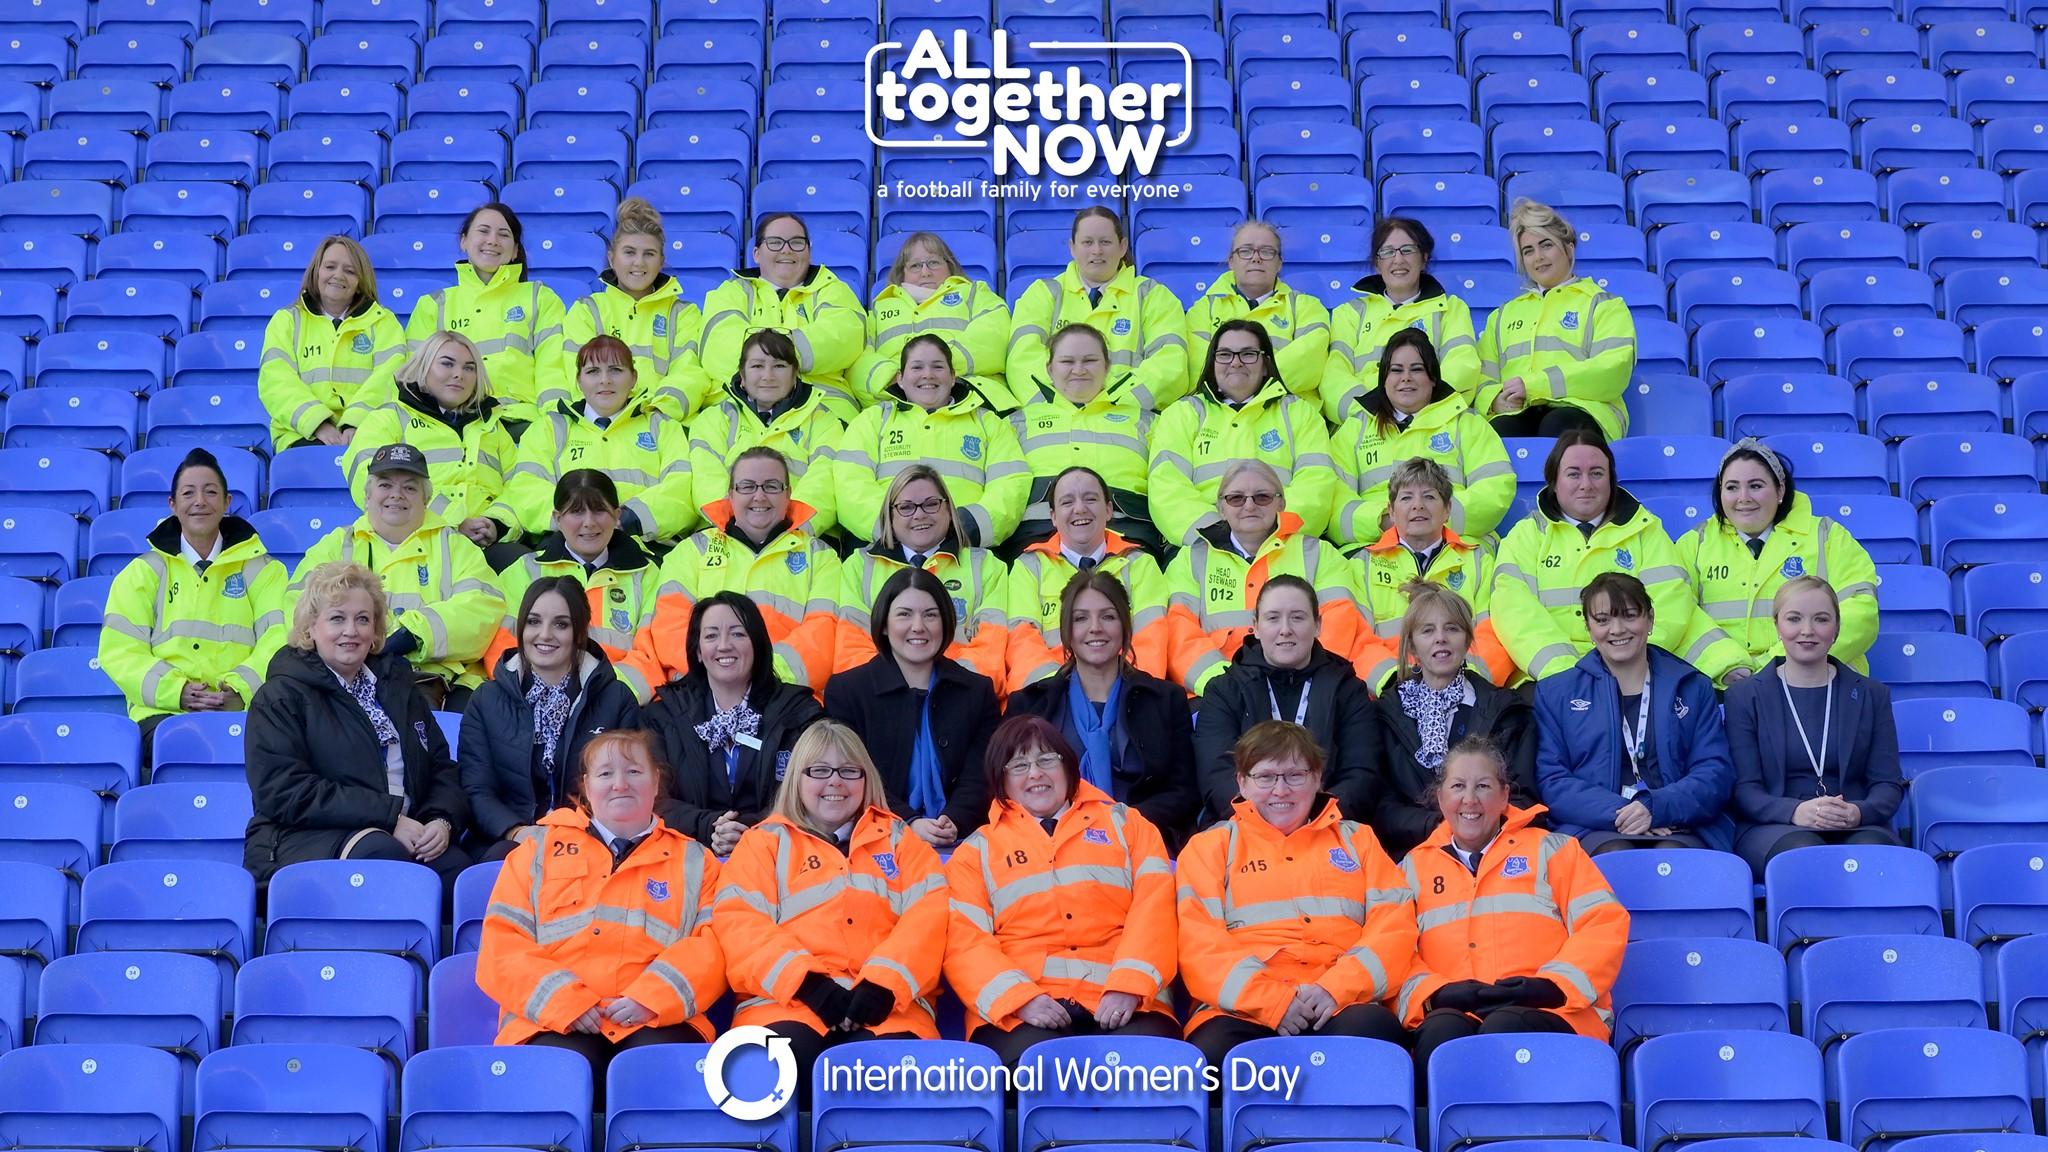 IWD3 Everton FC